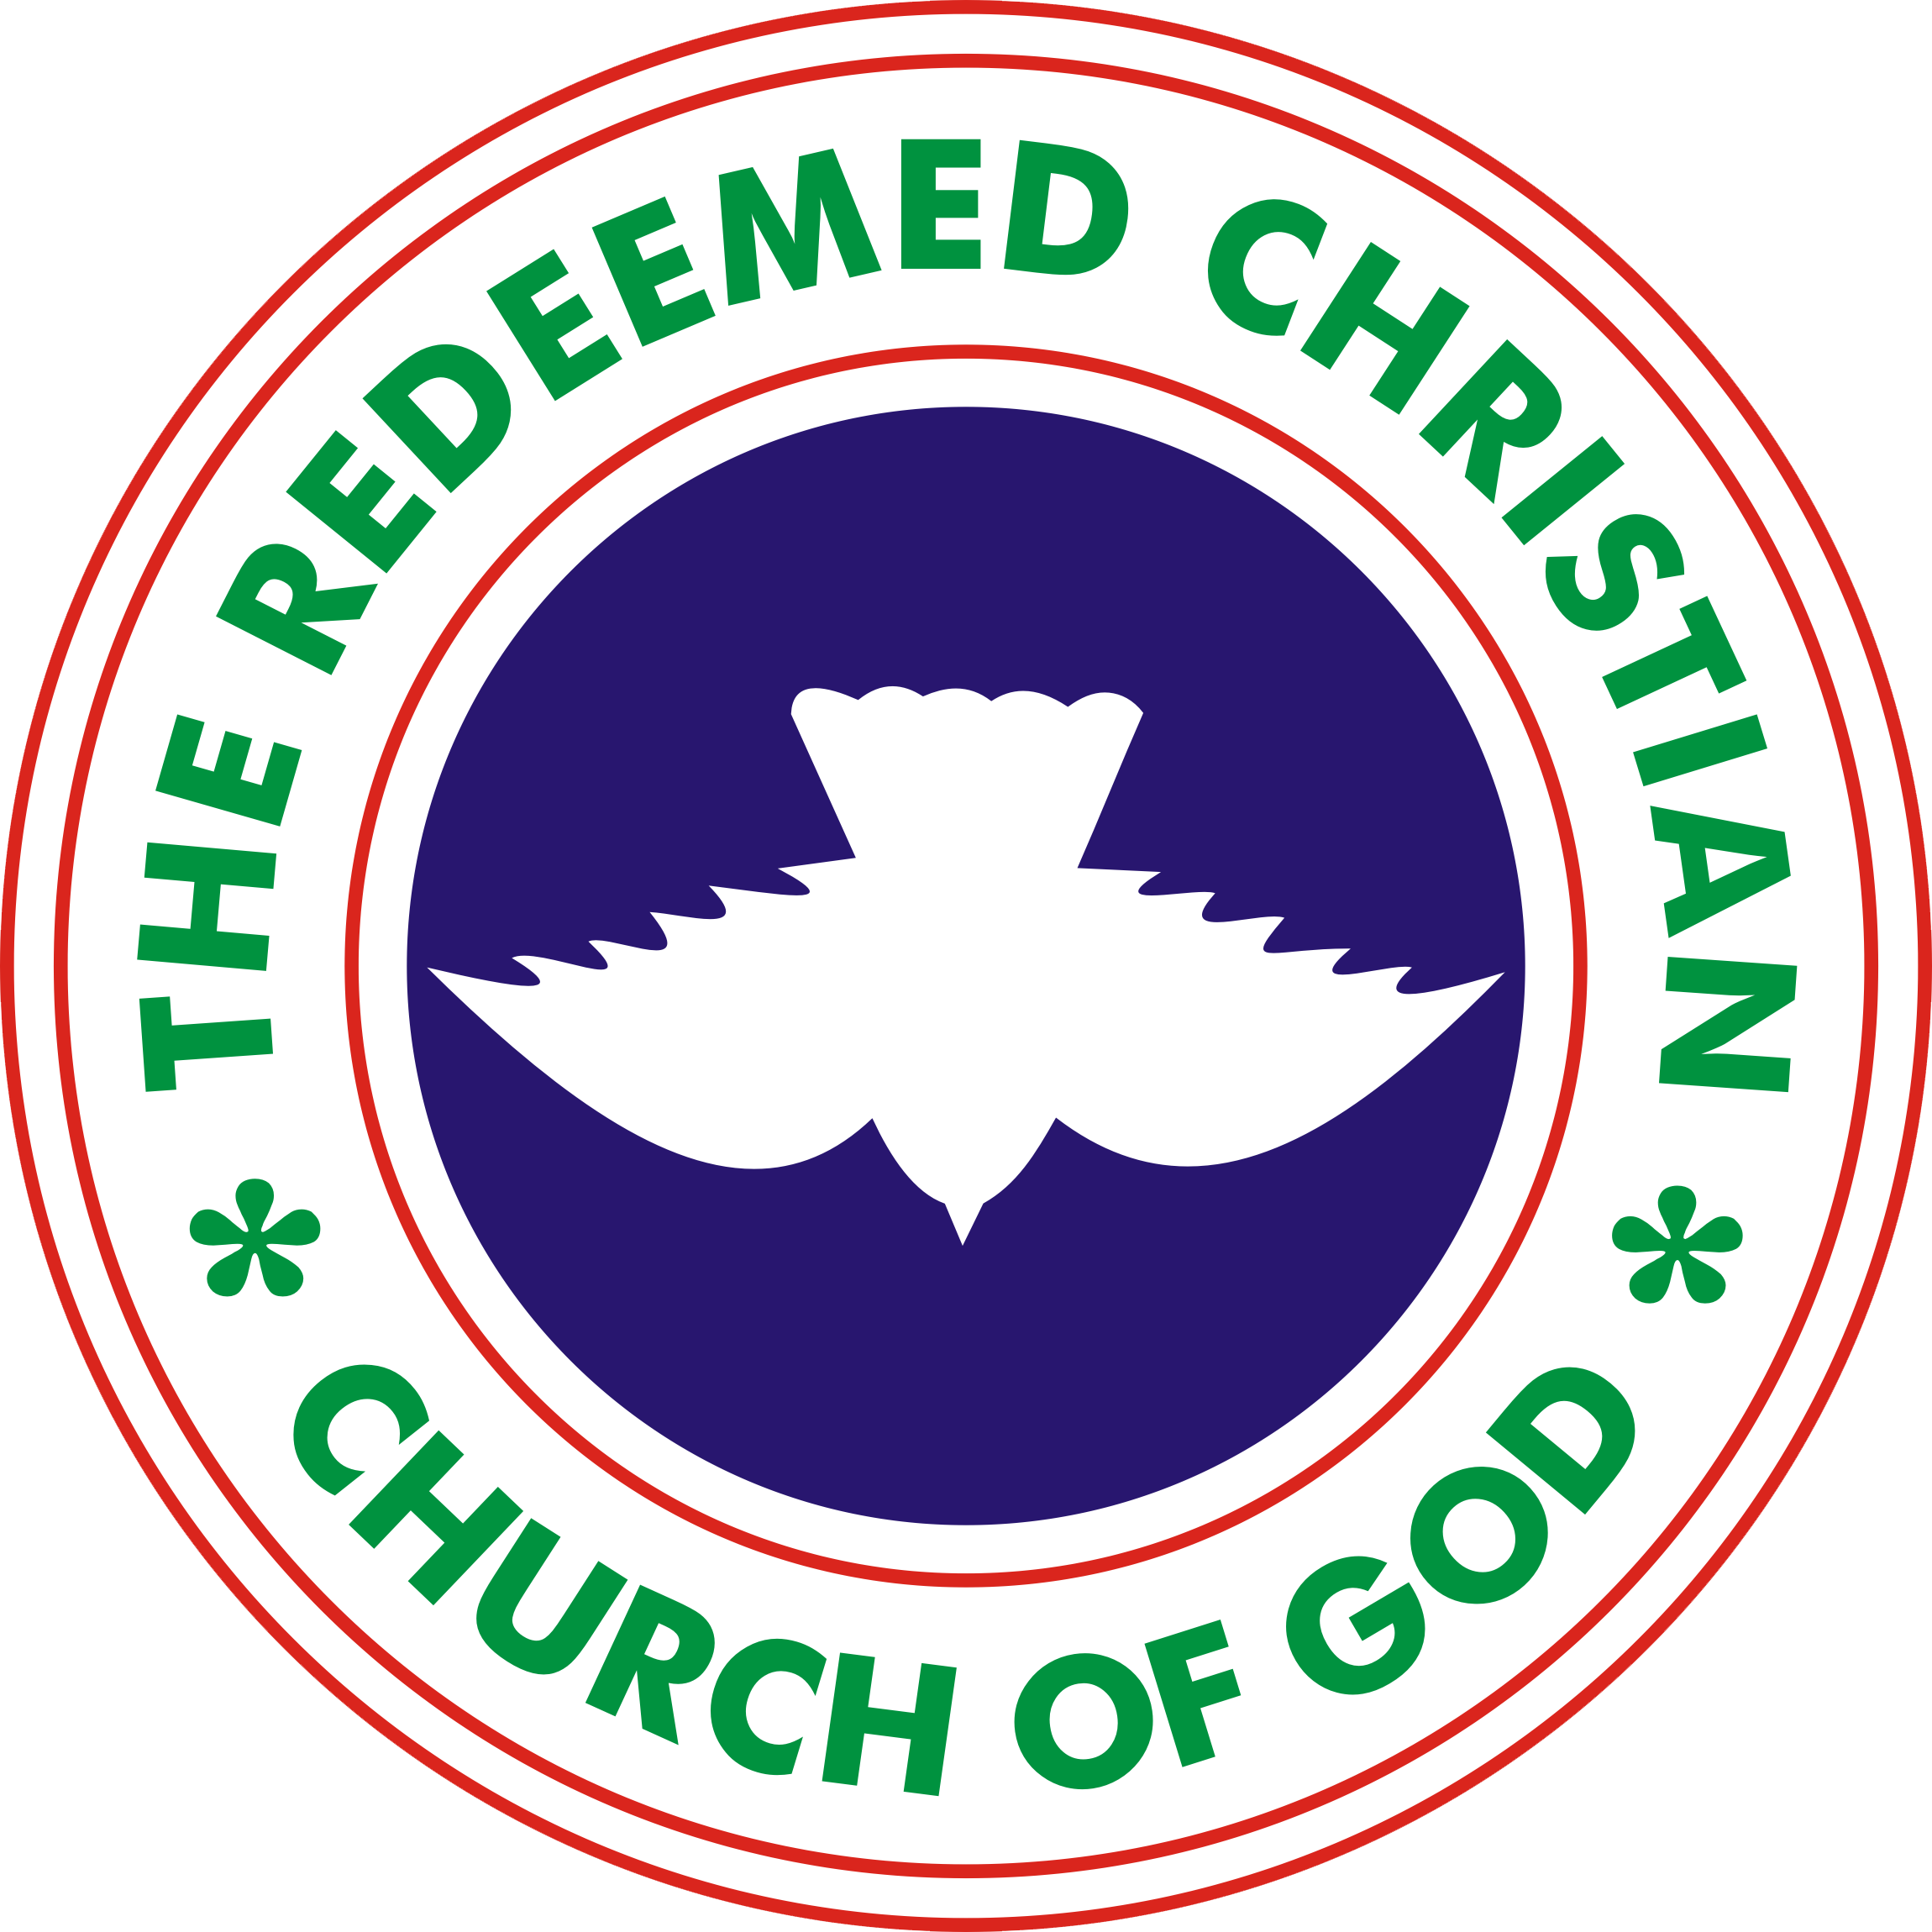 Rccg Logo - Redeemed Christian Church Logo (2300x2300), Png Download